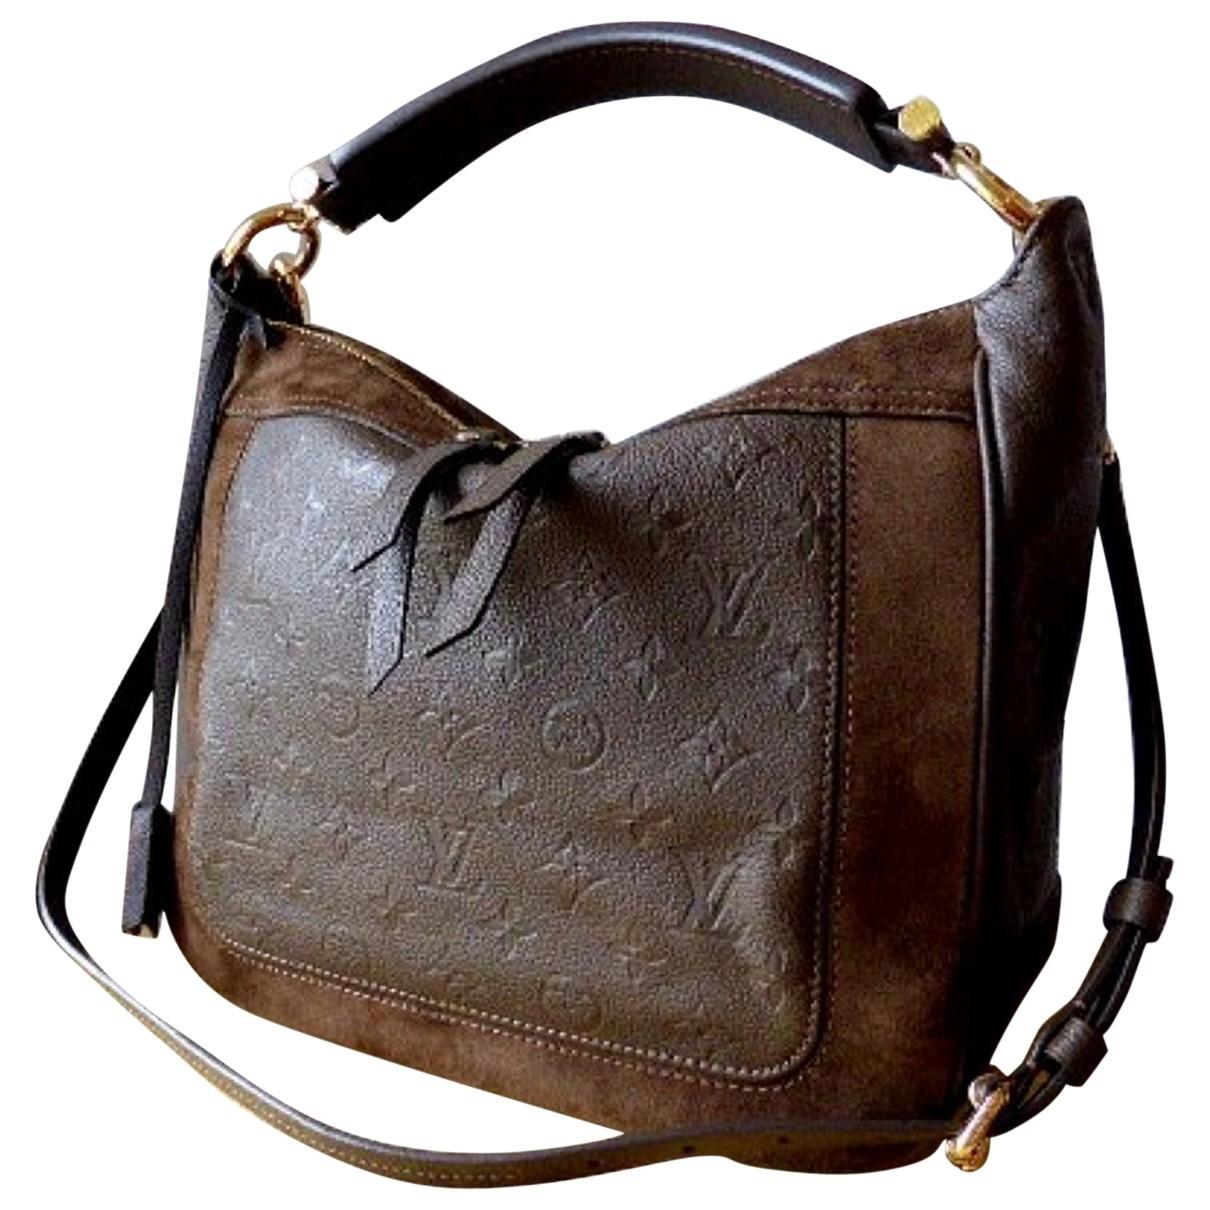 Louis Vuitton \N Brown Suede handbag for Women \N